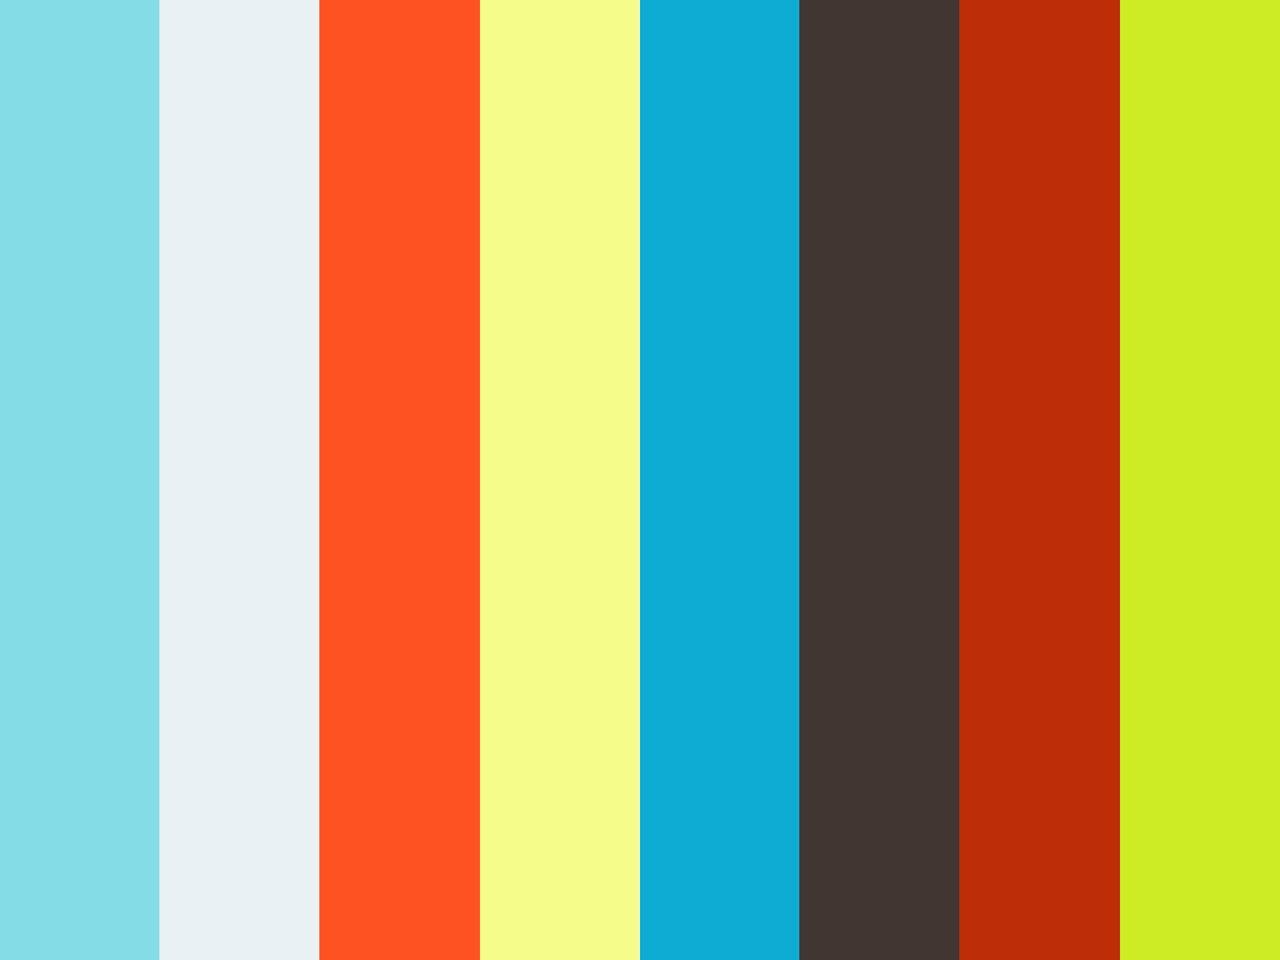 Webstock '14: Scott Berkun - The Year Without Pants: WordPress.com & The Future of Work